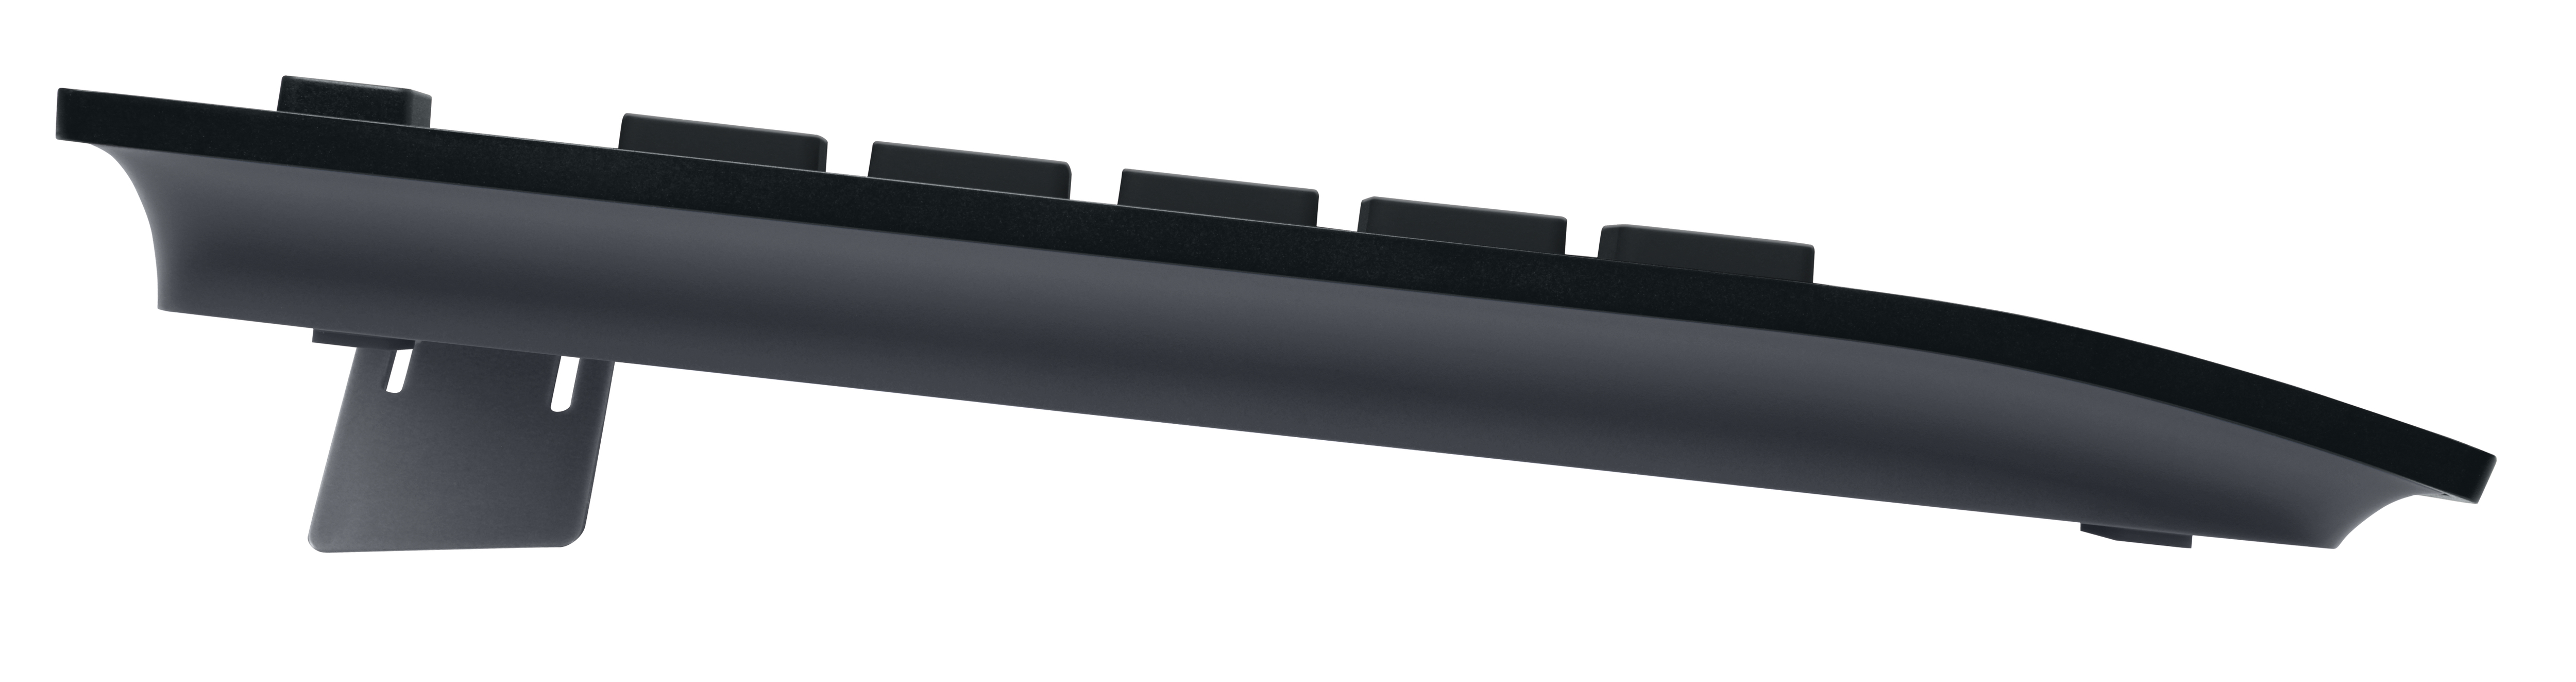 Corded K280e Keyboard (USB, Qwerty US)